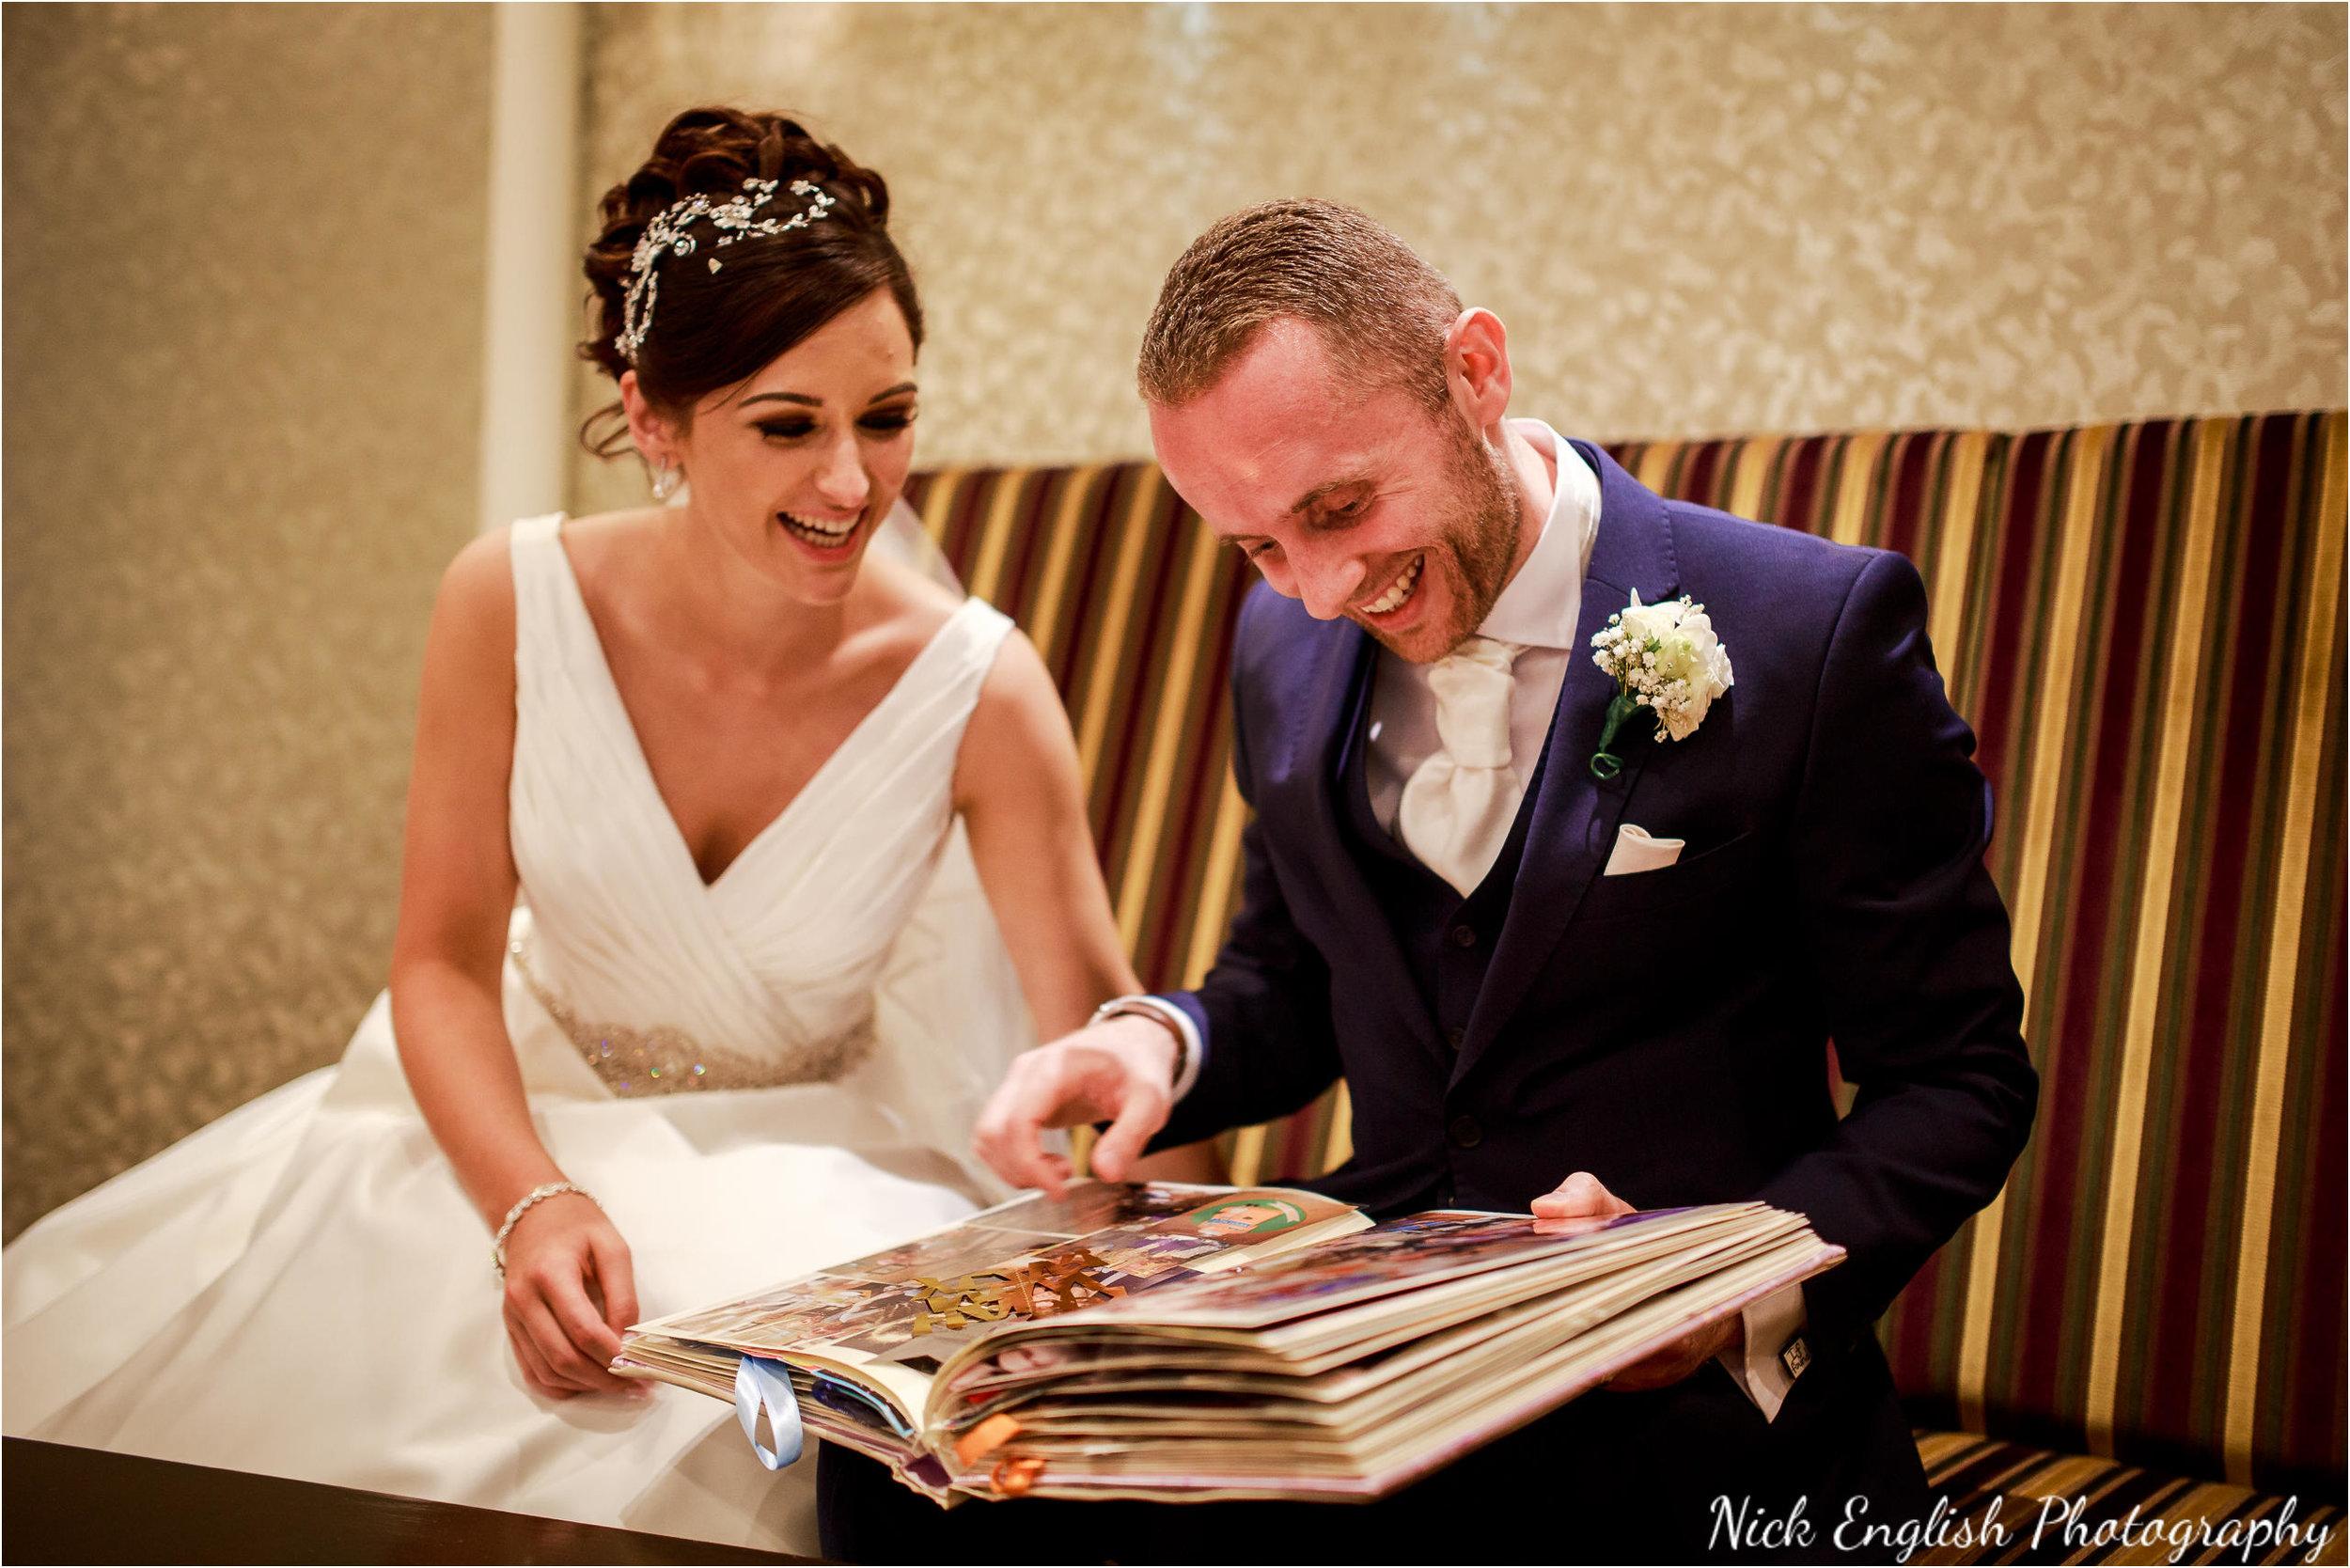 Emily David Wedding Photographs at Barton Grange Preston by Nick English Photography 164jpg.jpeg